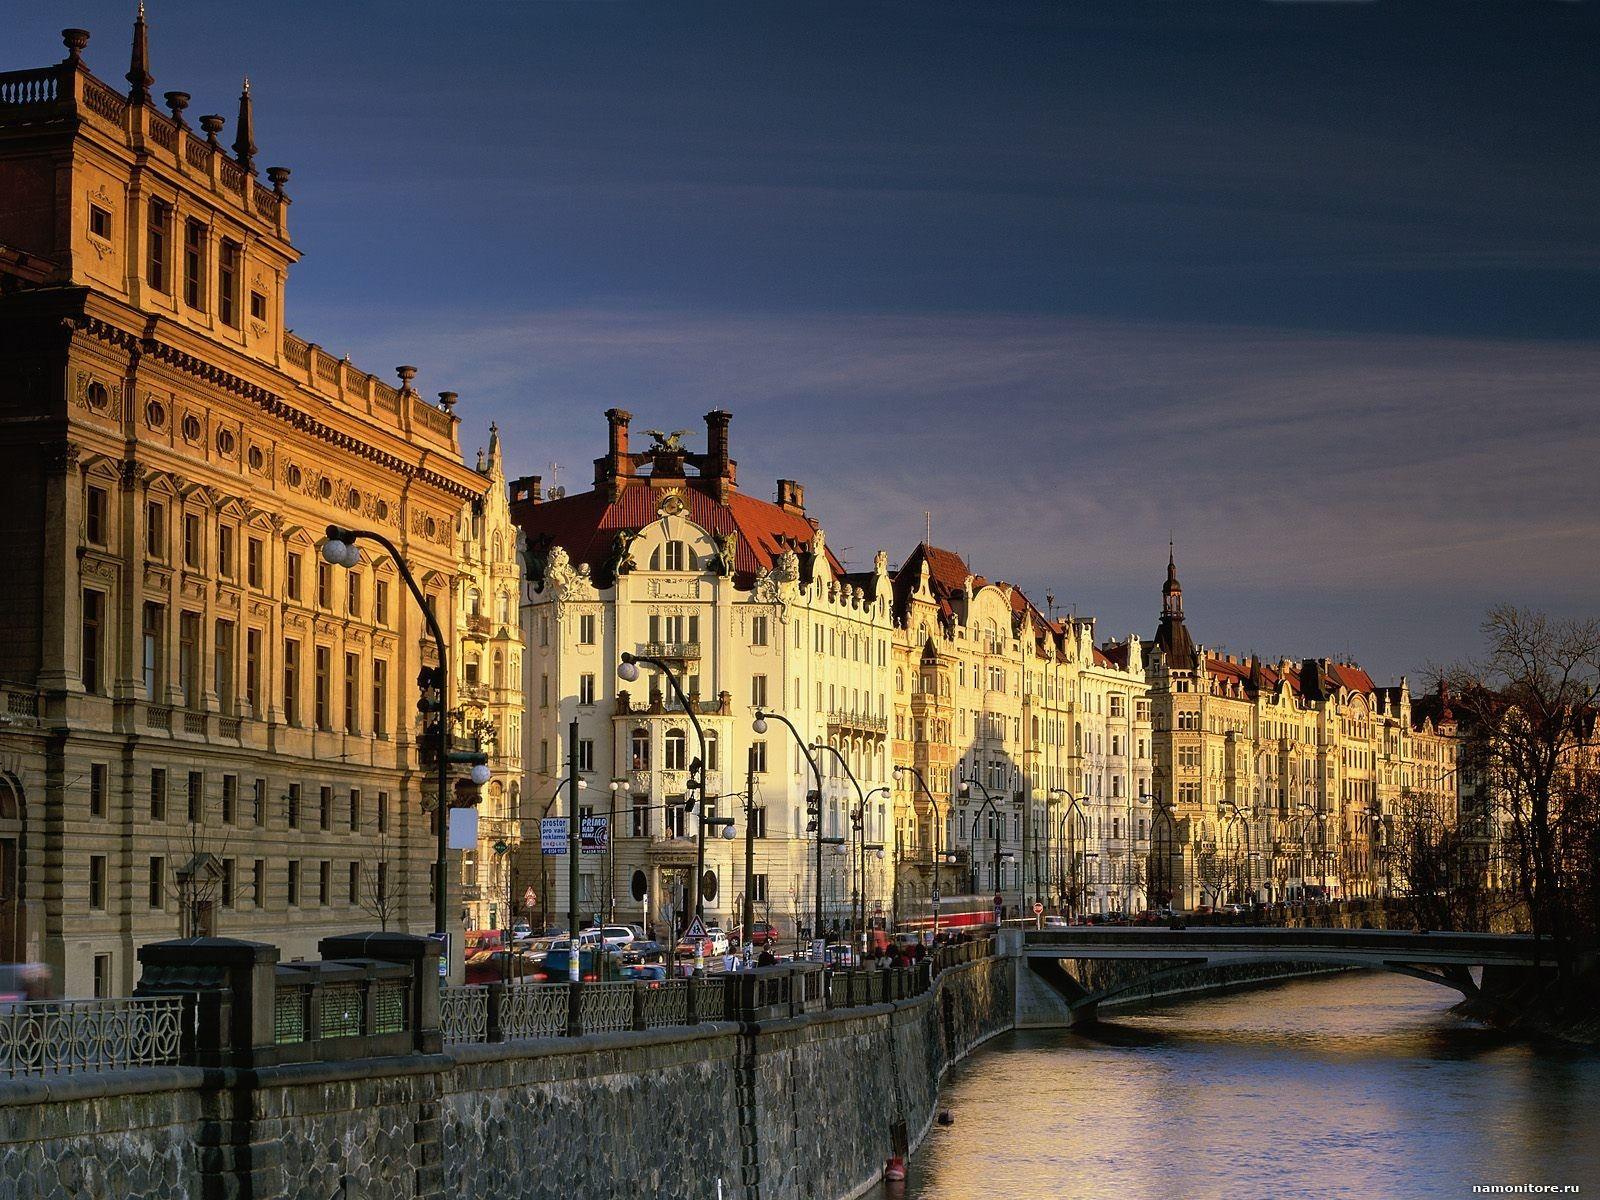 Prague, Czech Republic #travelnote #traveling #travel #trip #tour #travelers #traveler #europe #prague #tourism